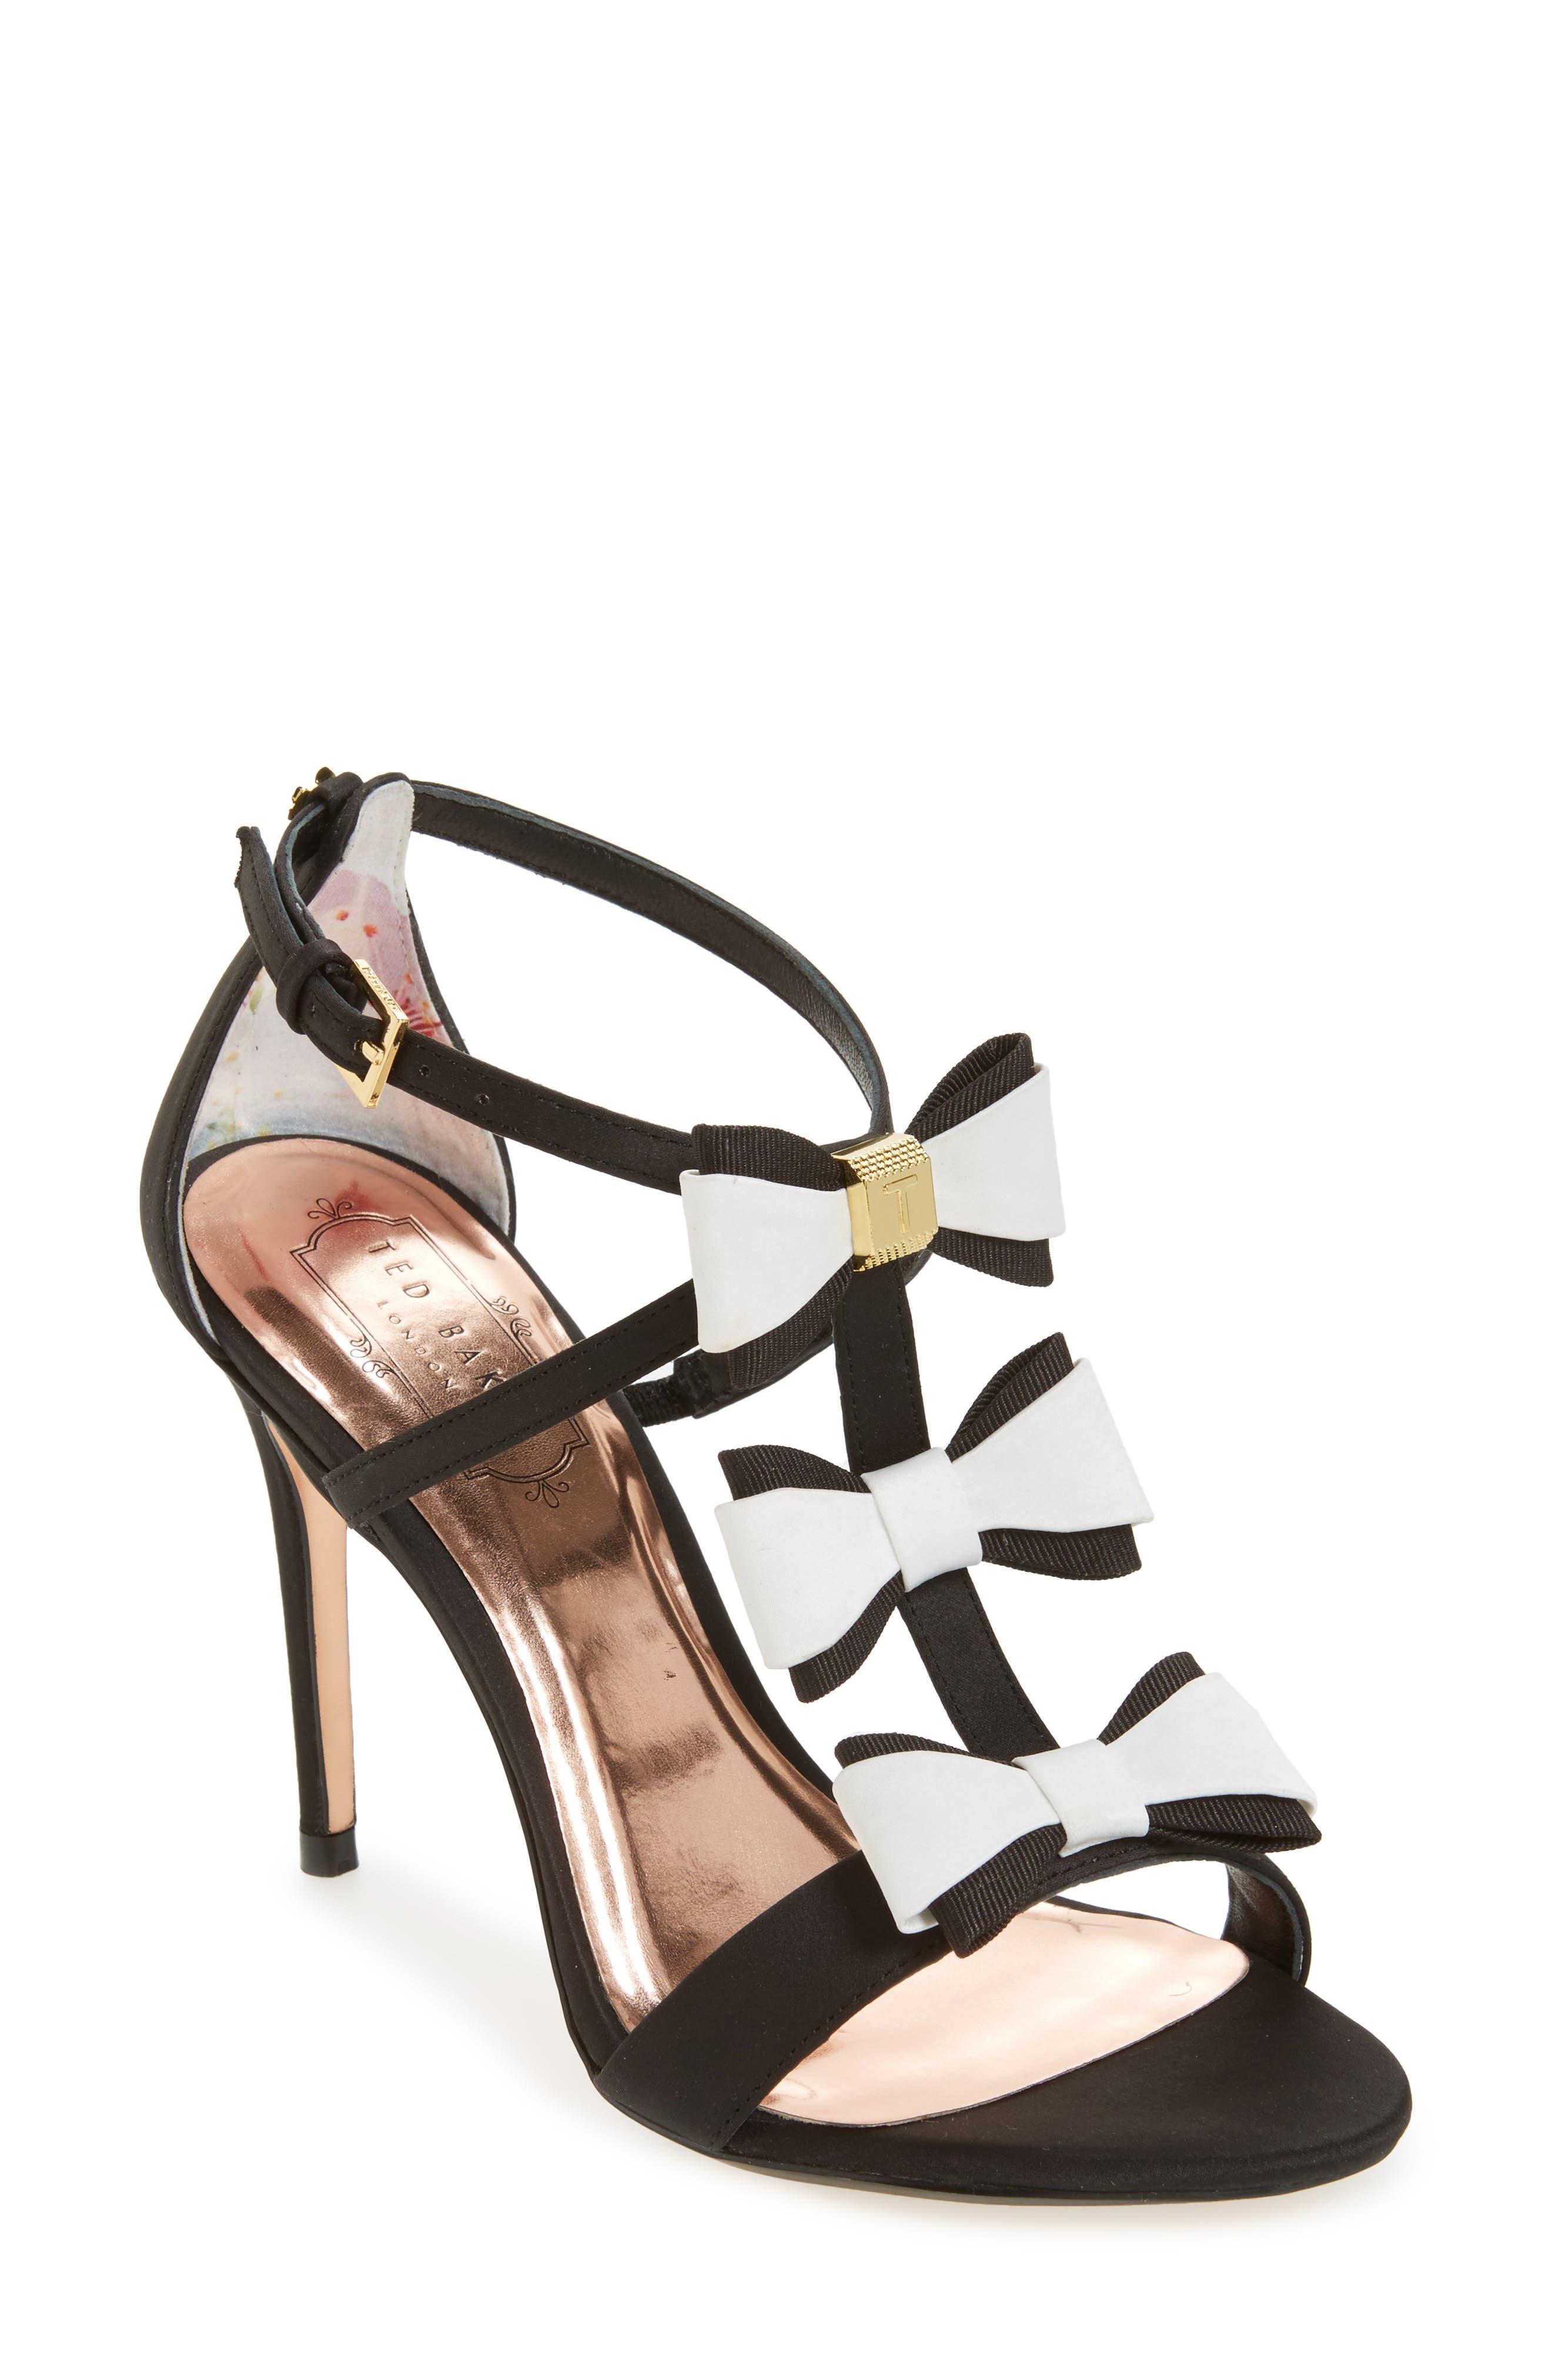 Ted Baker Appolini Bow Sandal,                             Main thumbnail 1, color,                             002